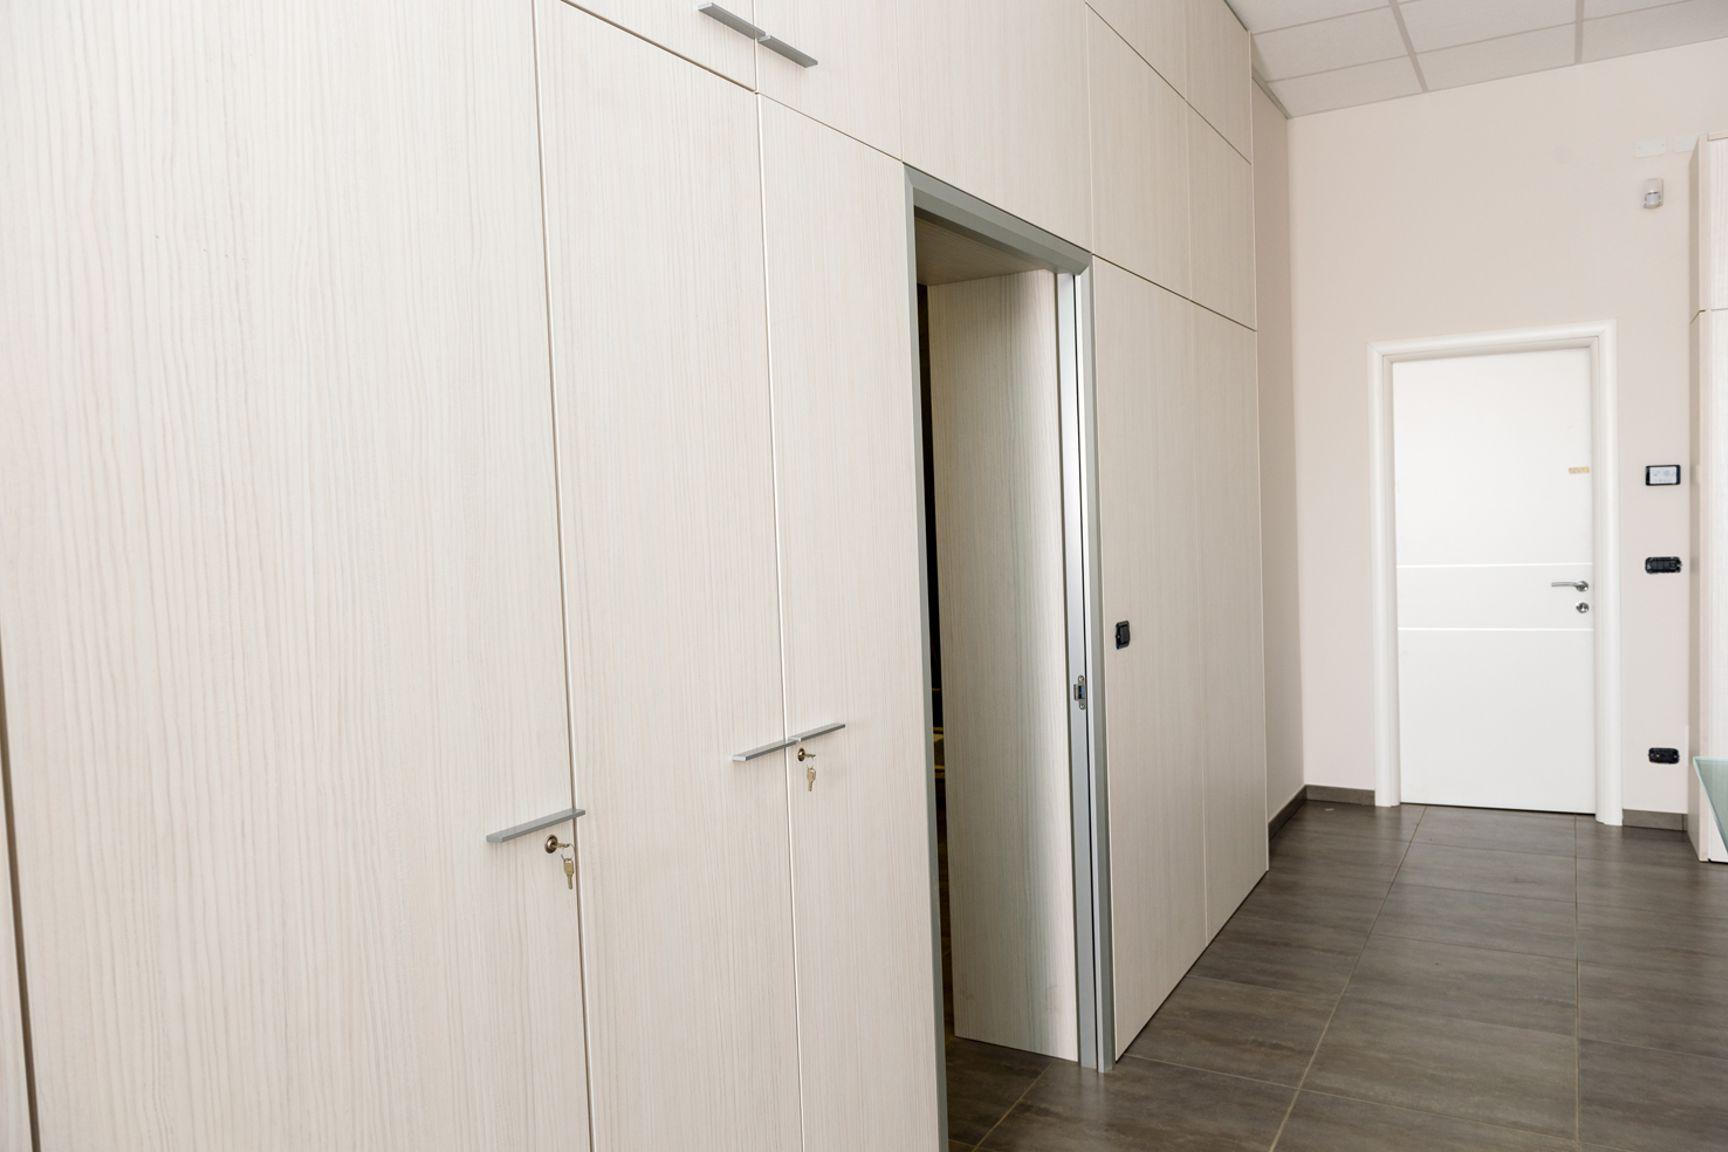 Soluzioni divisorie per interni with soluzioni divisorie - Pareti decorative in cartongesso ...